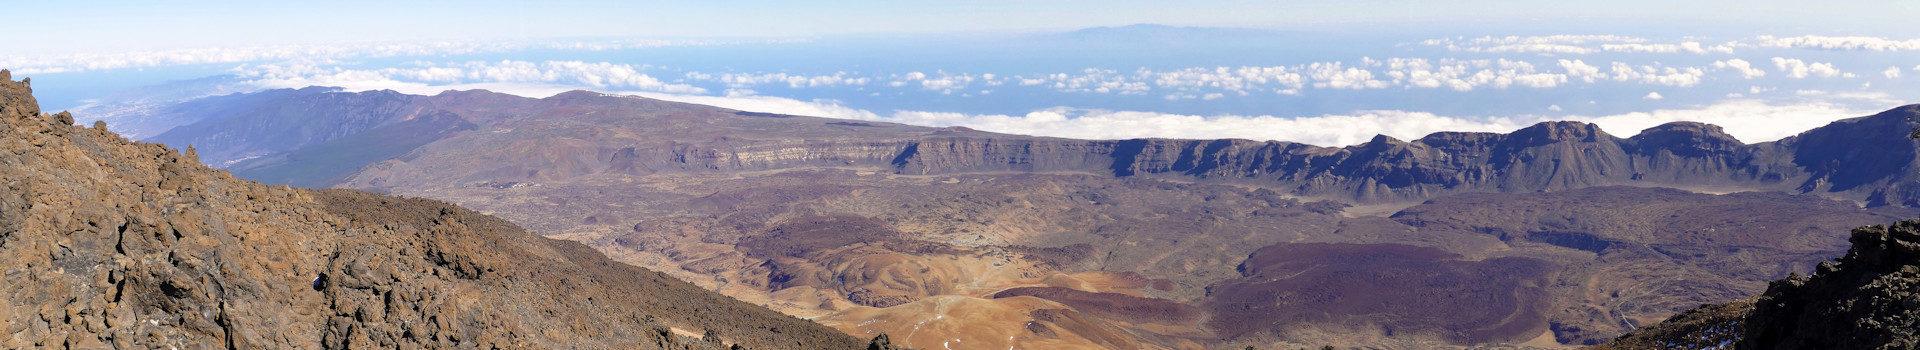 Pico del Teide (3.715 m)